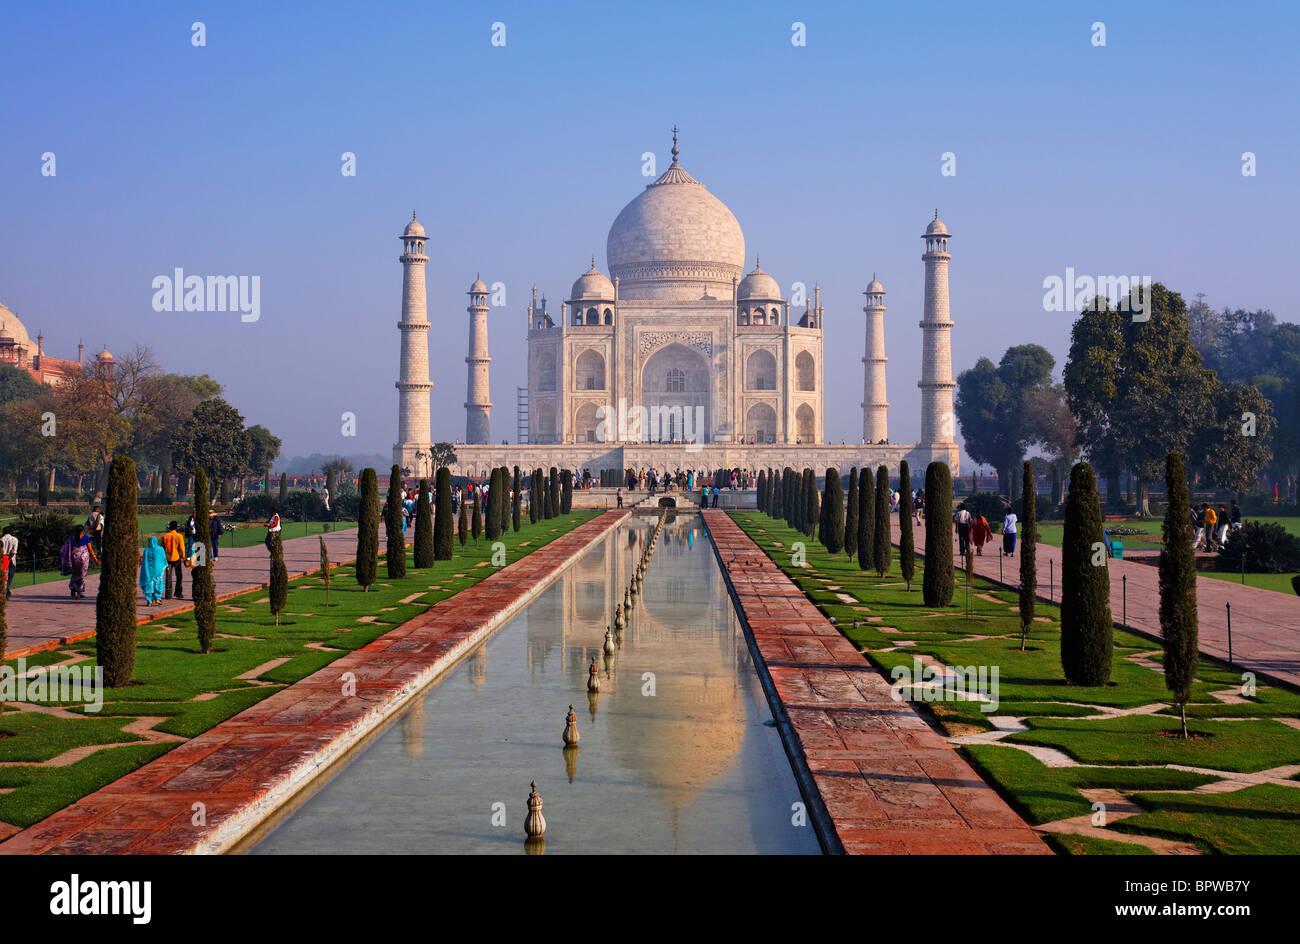 El Taj Mahal, Agra, Uttar Pradesh, India Imagen De Stock